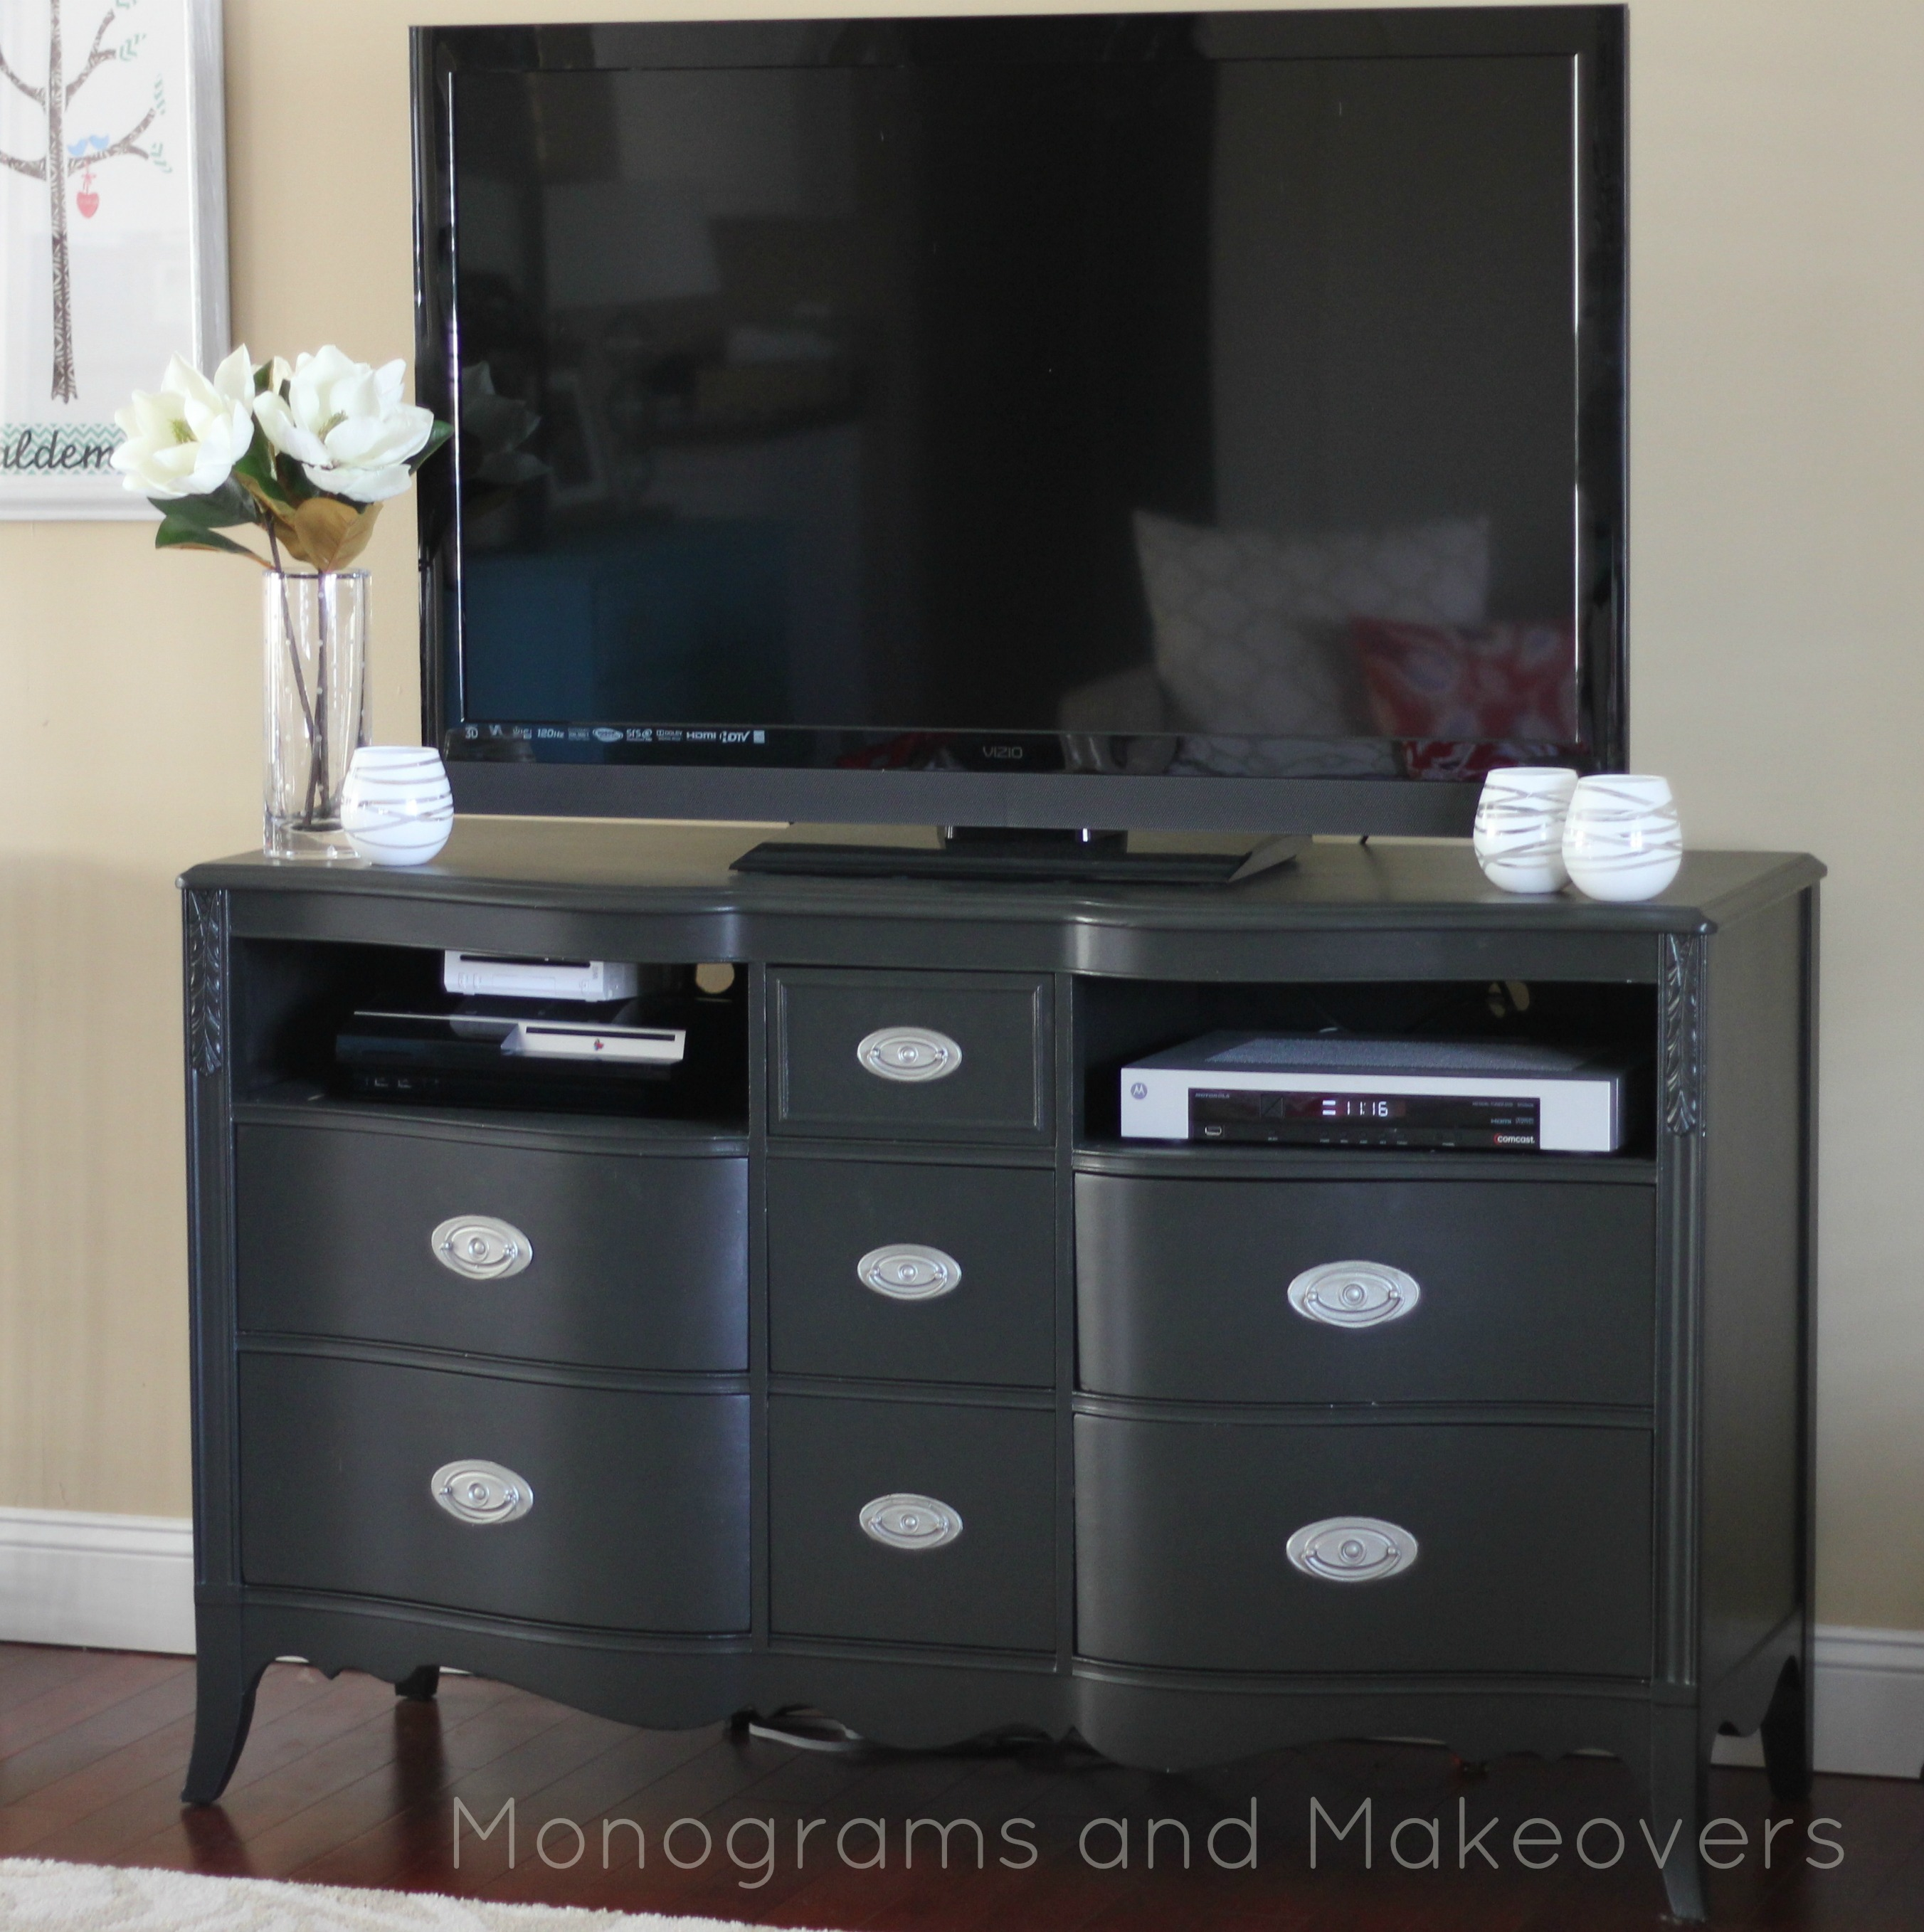 Refurbished Furniture  Monograms and Makeovers